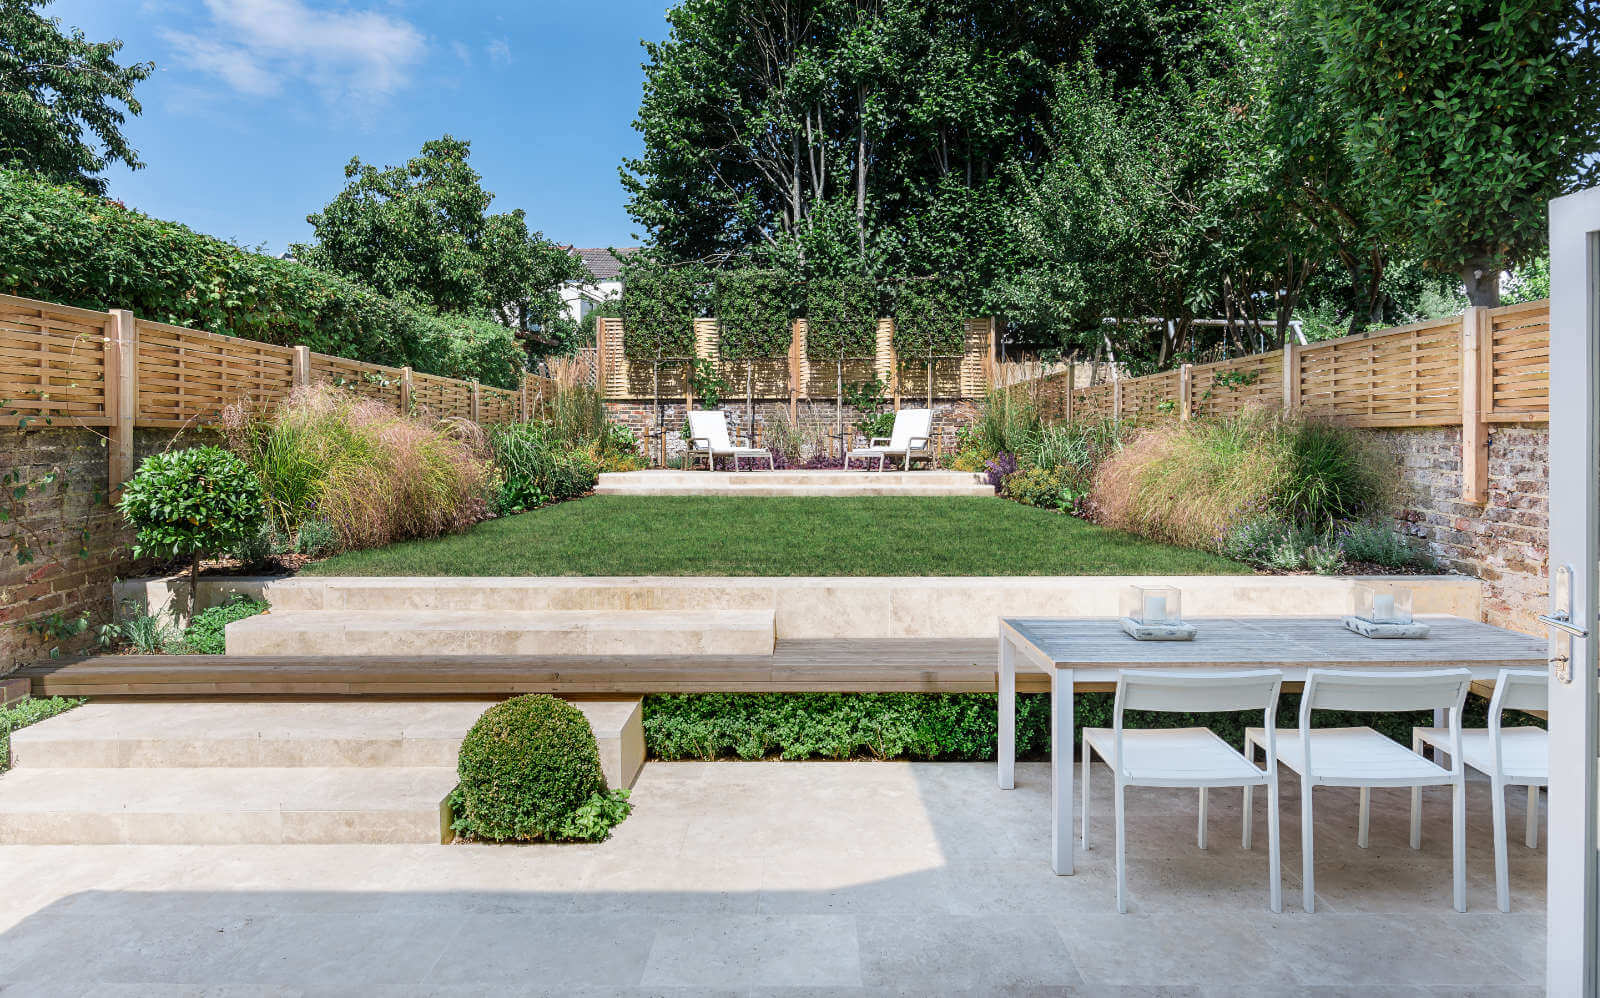 Alternating Garden - Photo 4